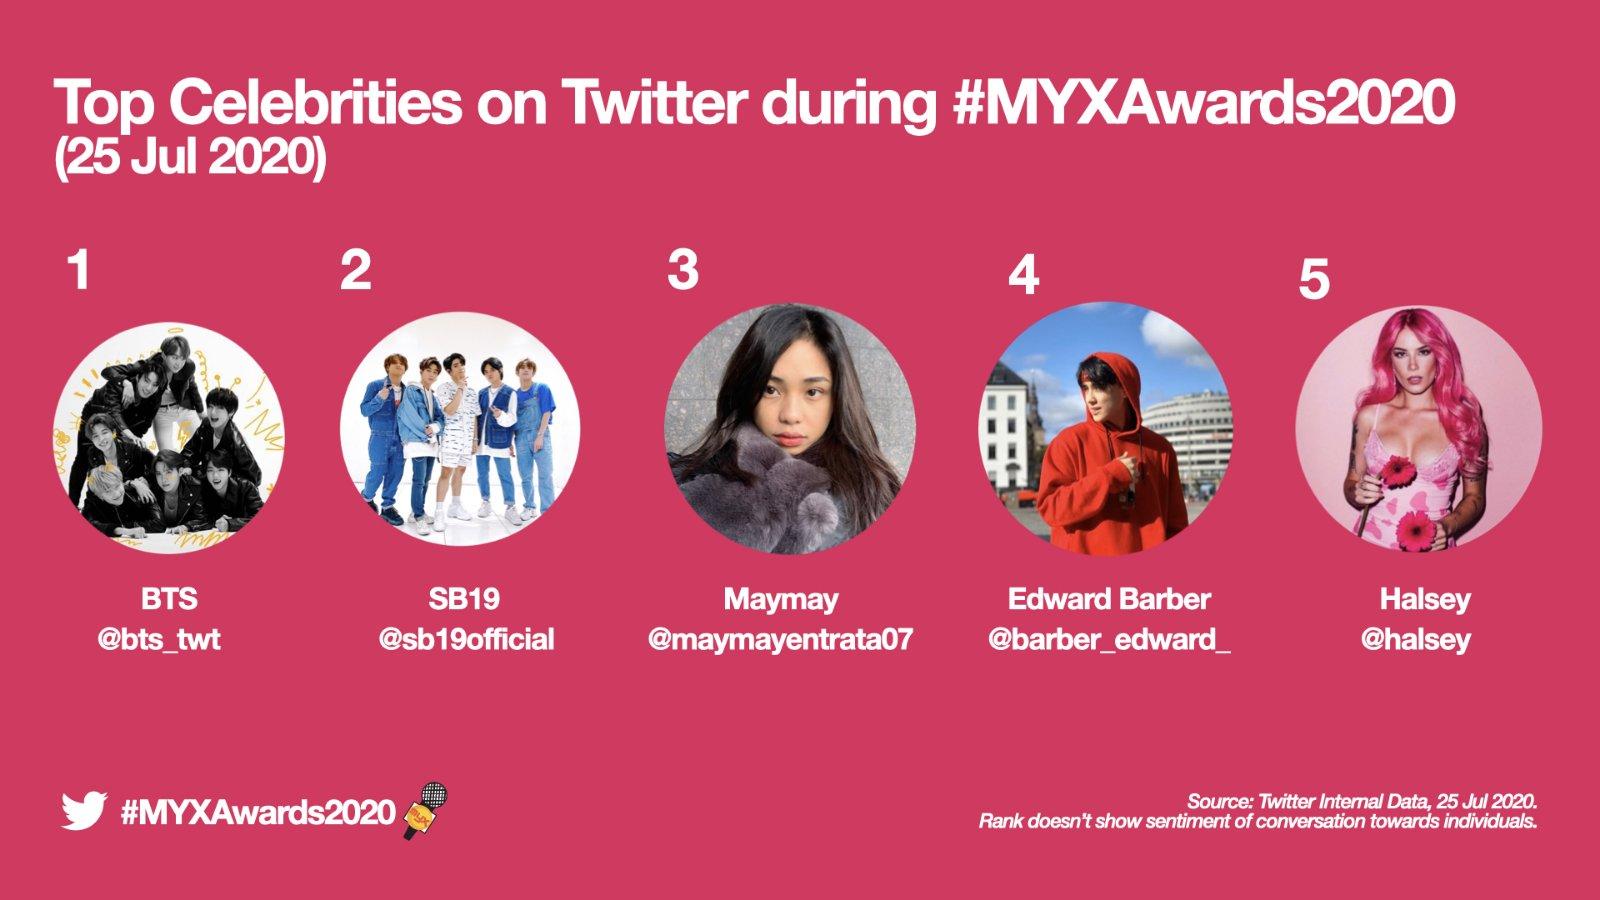 MYX Awards 2020 top celebrities on Twitter